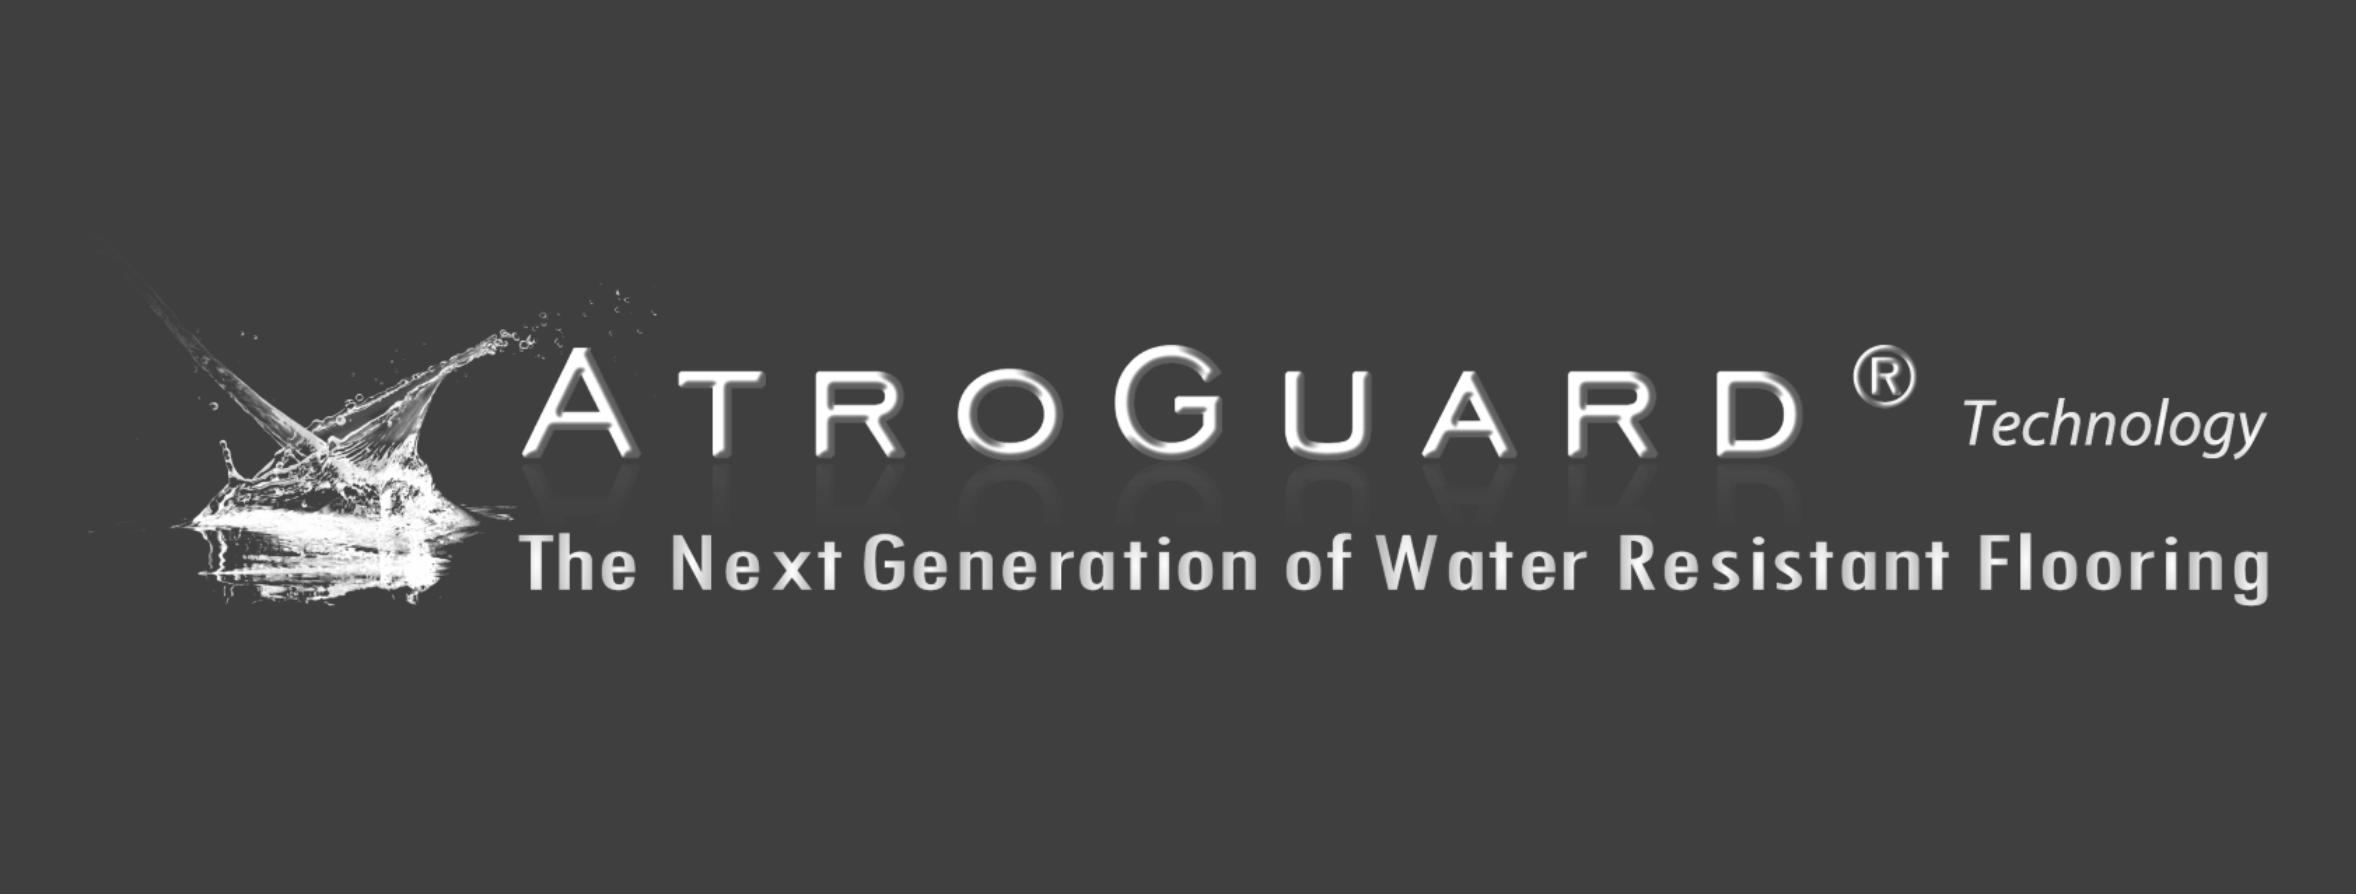 Atroguard logo gray scale.png